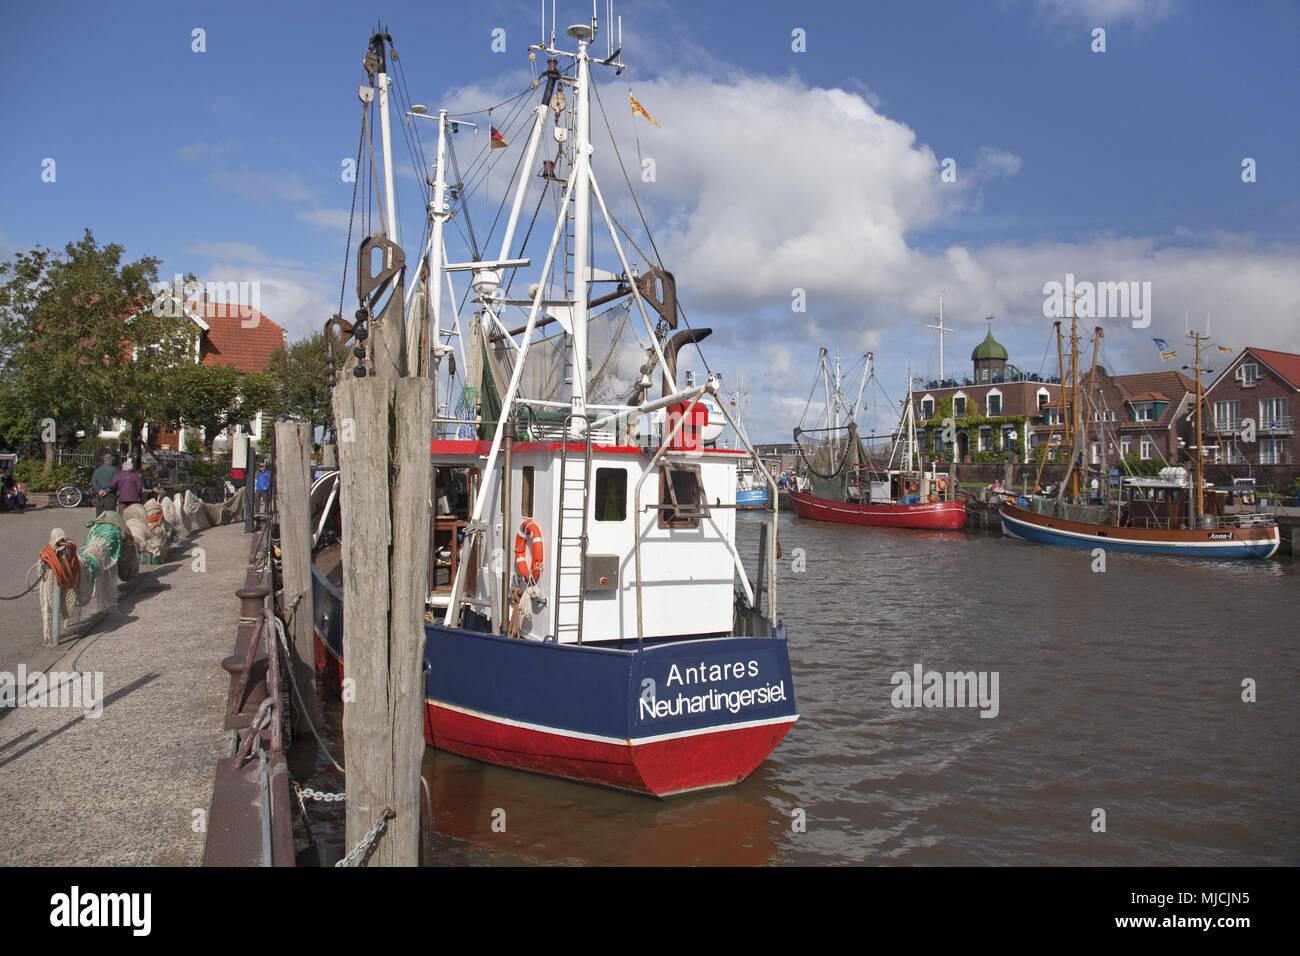 Fishing trawler in the harbour of Neuharlingersiel, Lower Saxony, North Germany, Germany, Europe, Stock Photo